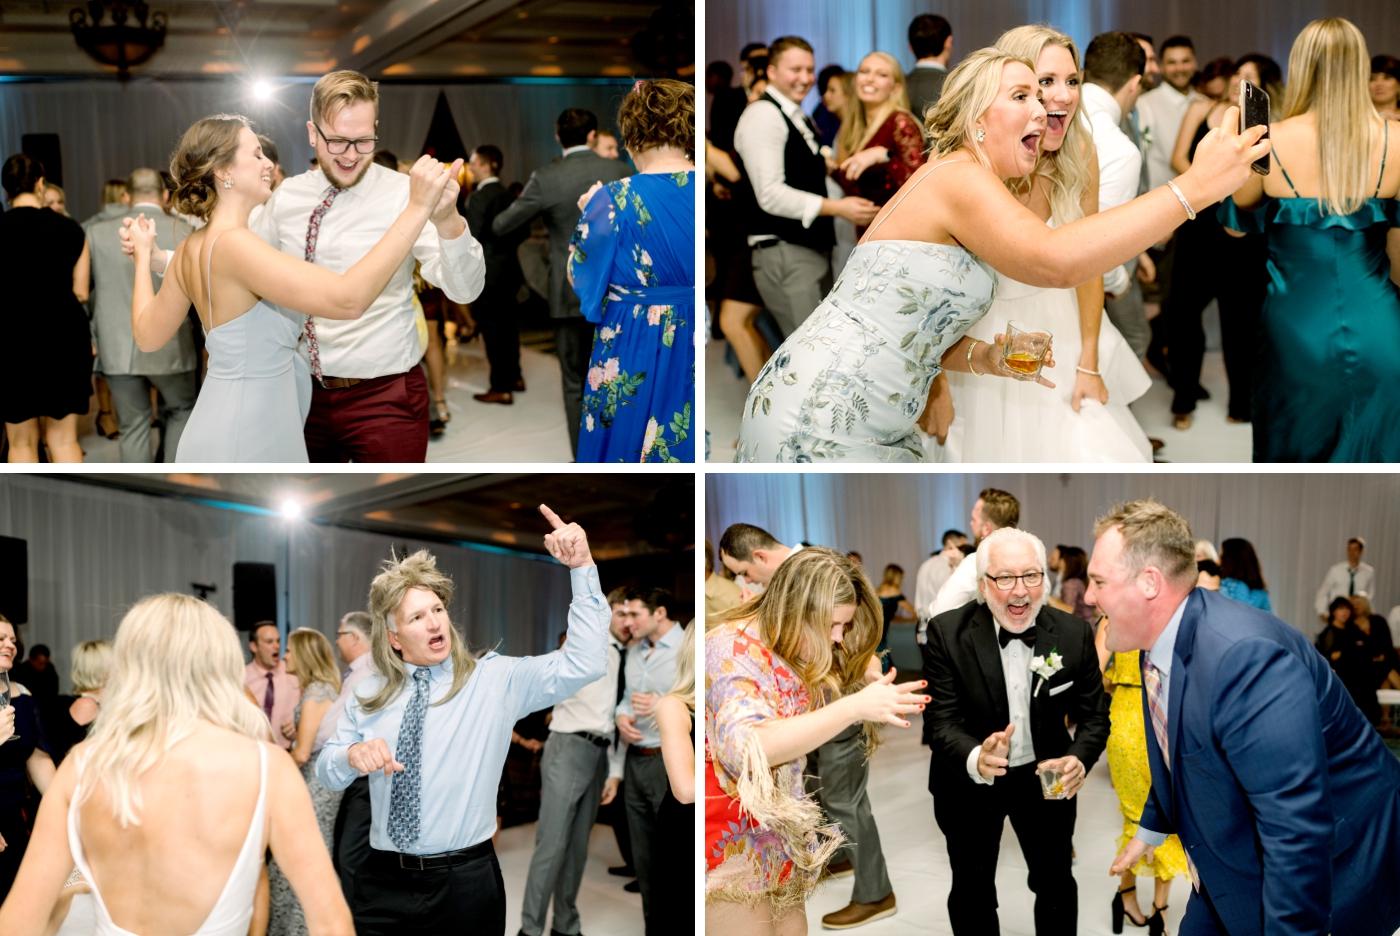 Mastrapa Weddings